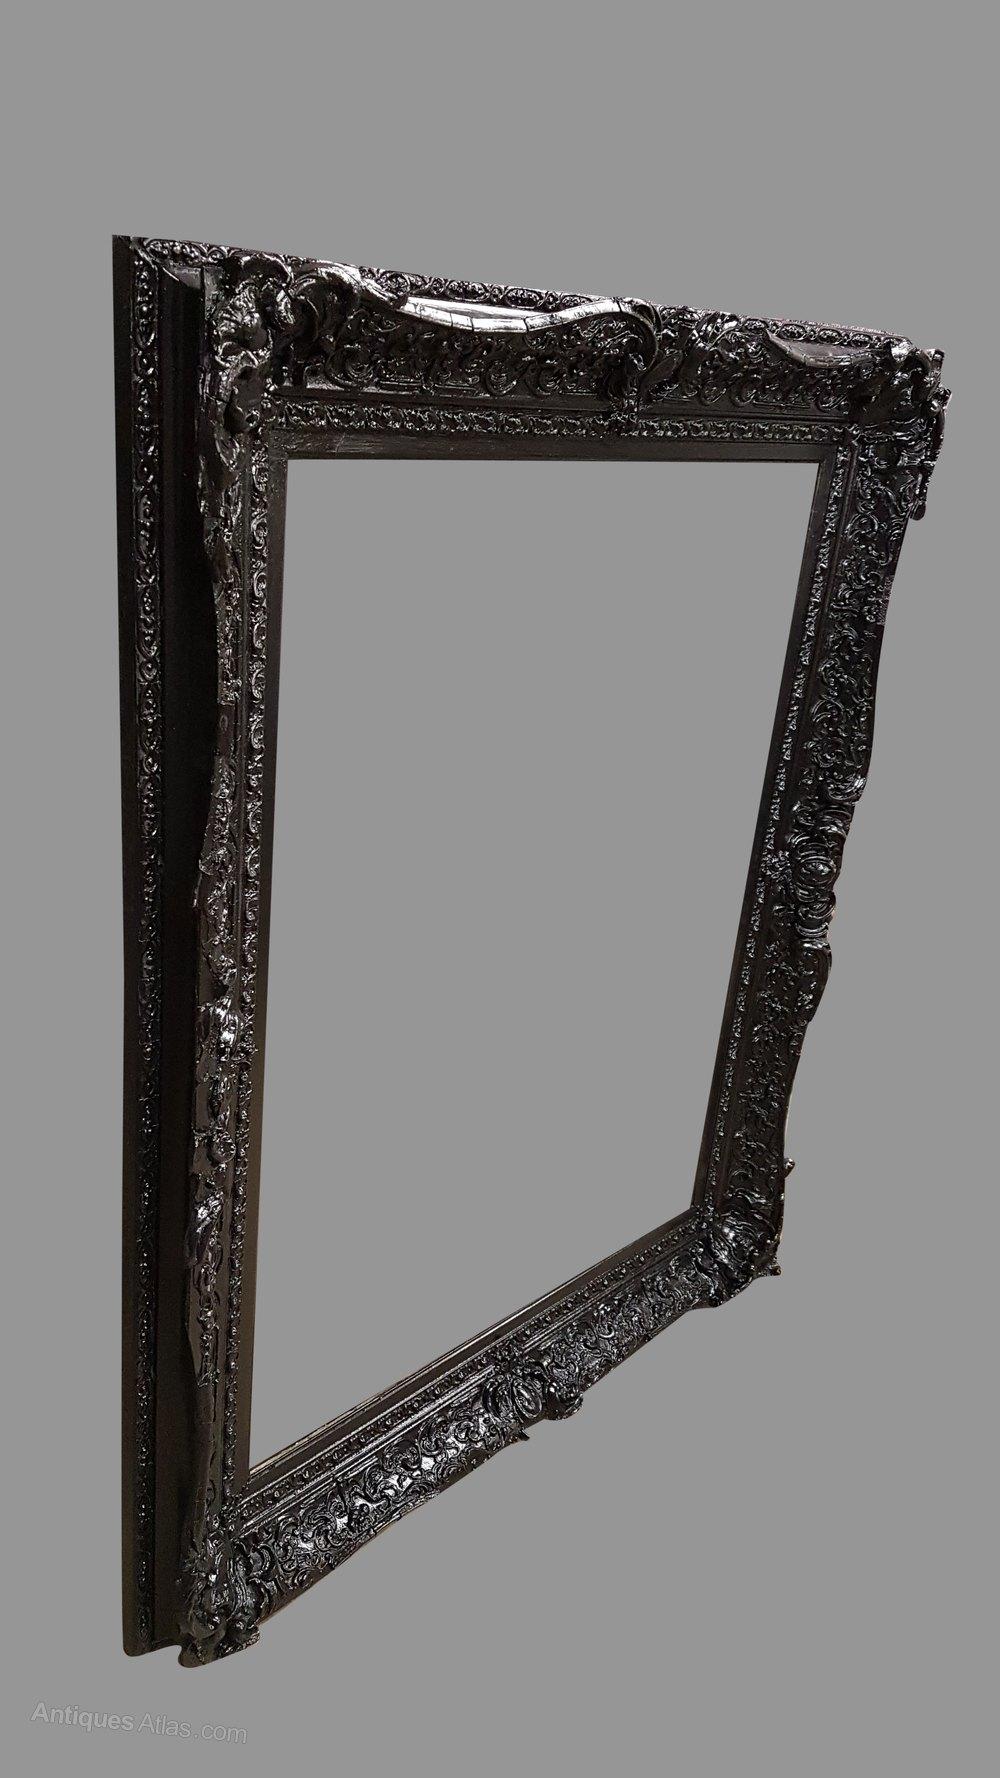 Antiques Atlas - Large Victorian Frame In Black